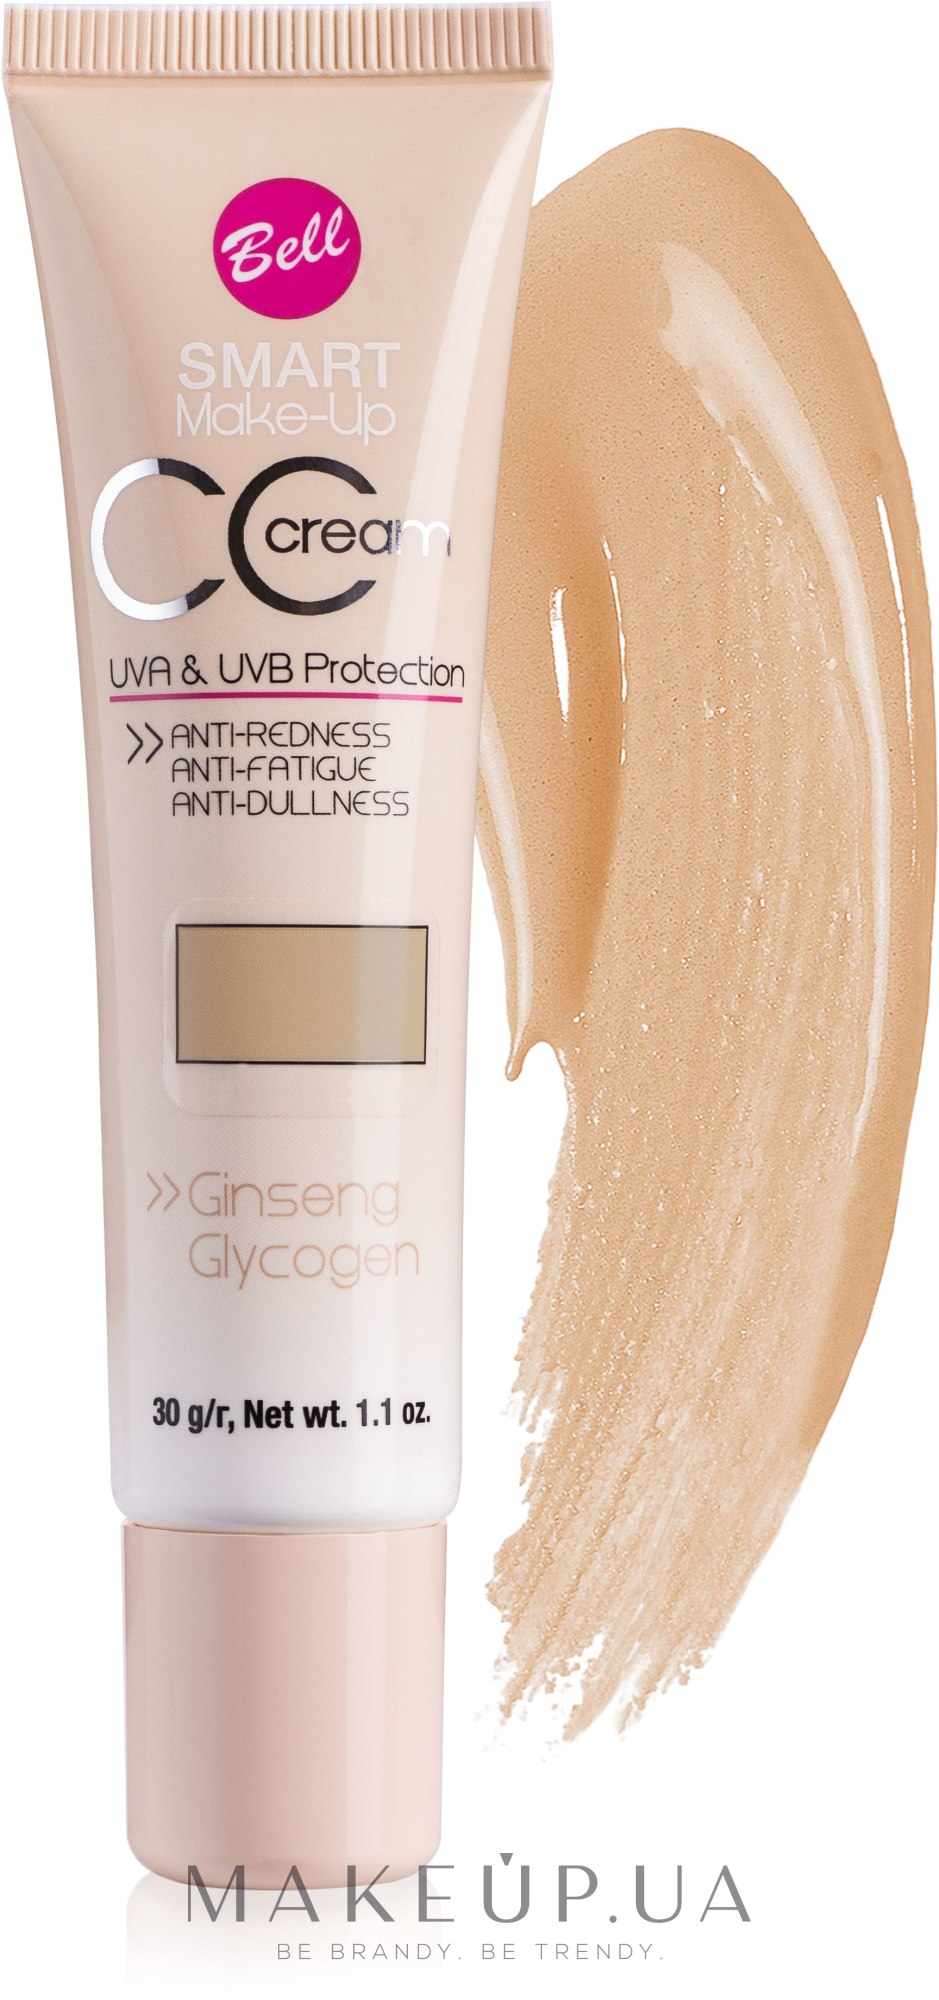 Крем-флюид - CC Cream Smart Make-Up Bell — фото 23